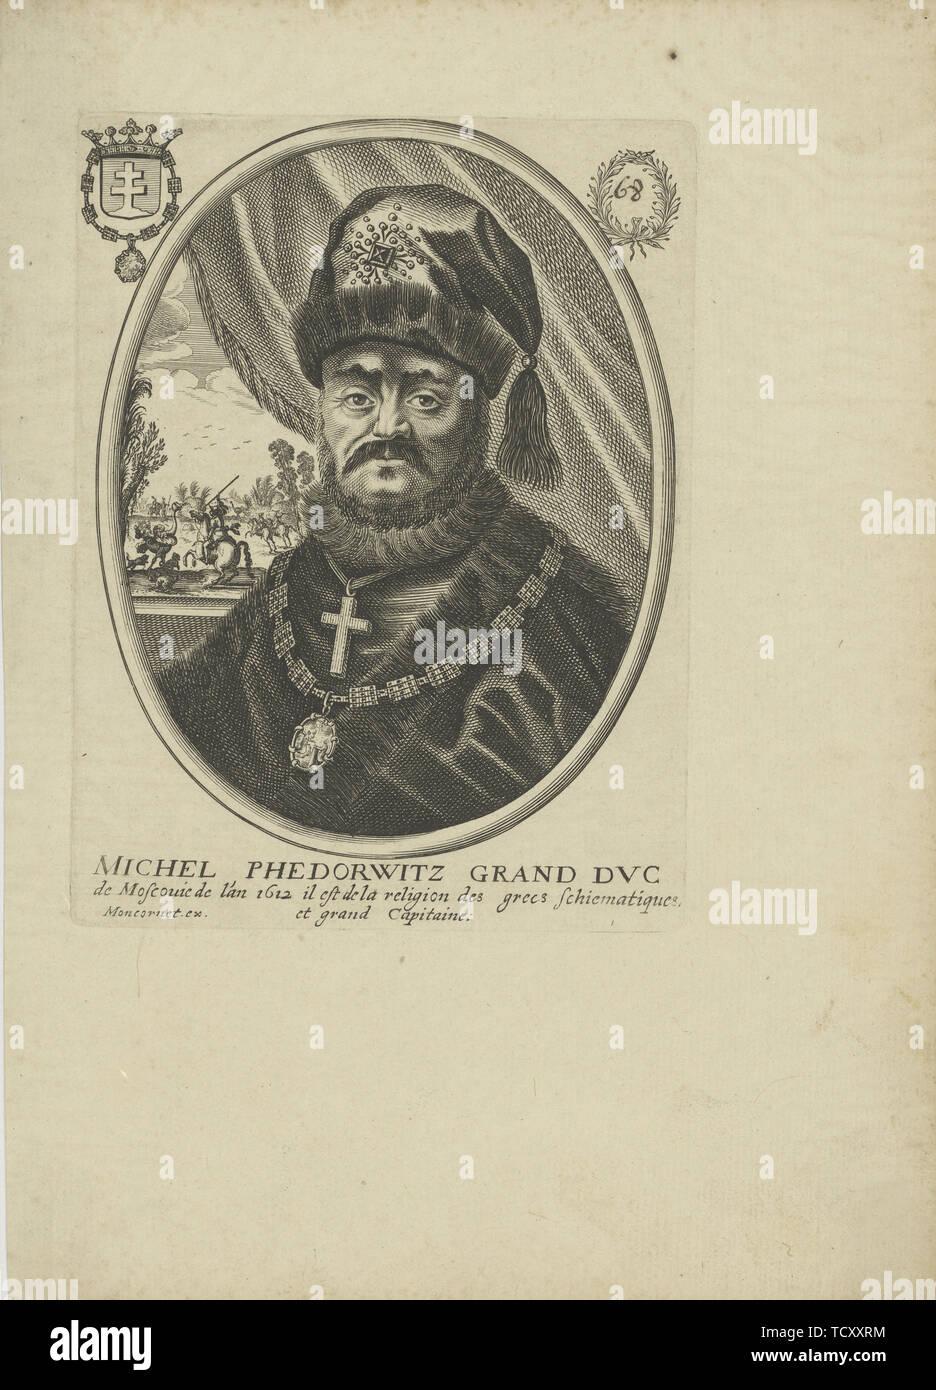 Portrait of the Tsar Michail I Fyodorovich of Russia (1596-1645), um 1640-1650. Creator: Moncornet, Balthazar (1600-1668). Stock Photo